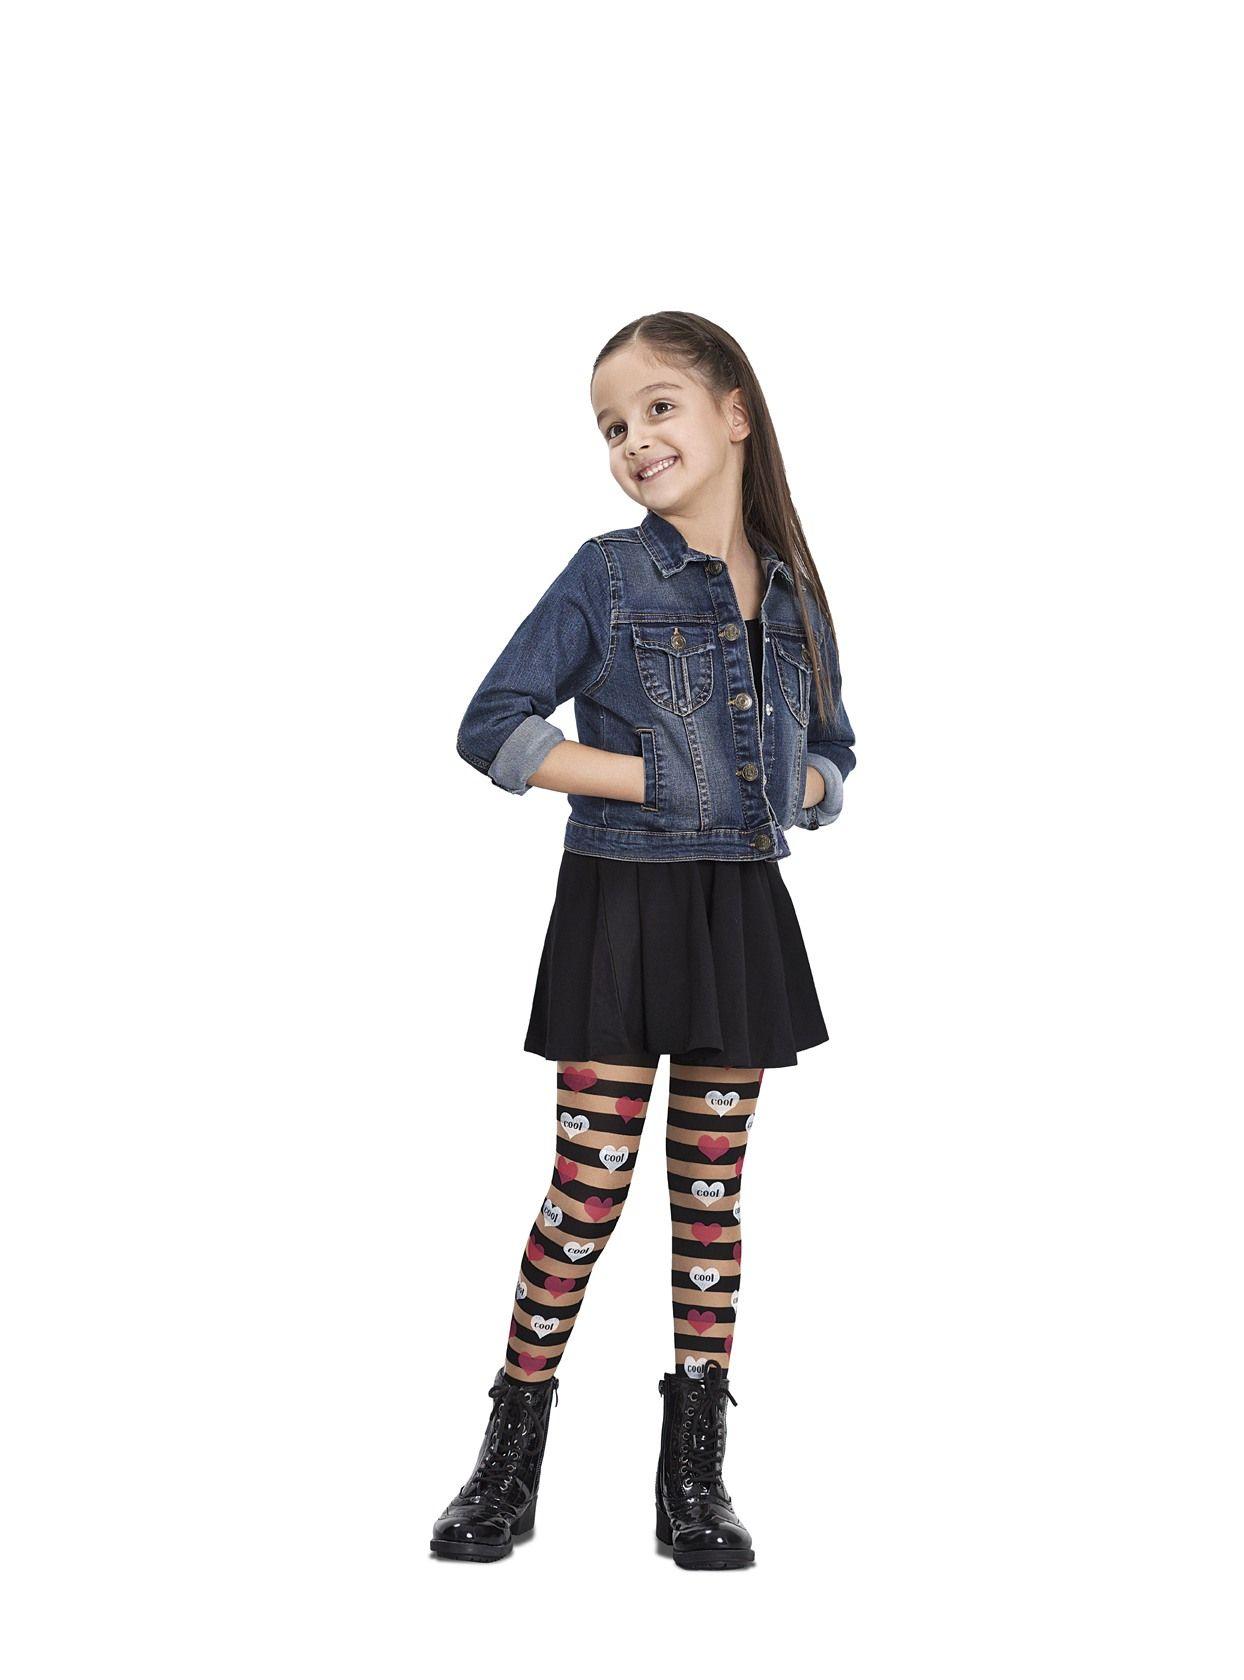 Kids Amp Baby Girls Tights Hearts Printed Fashion